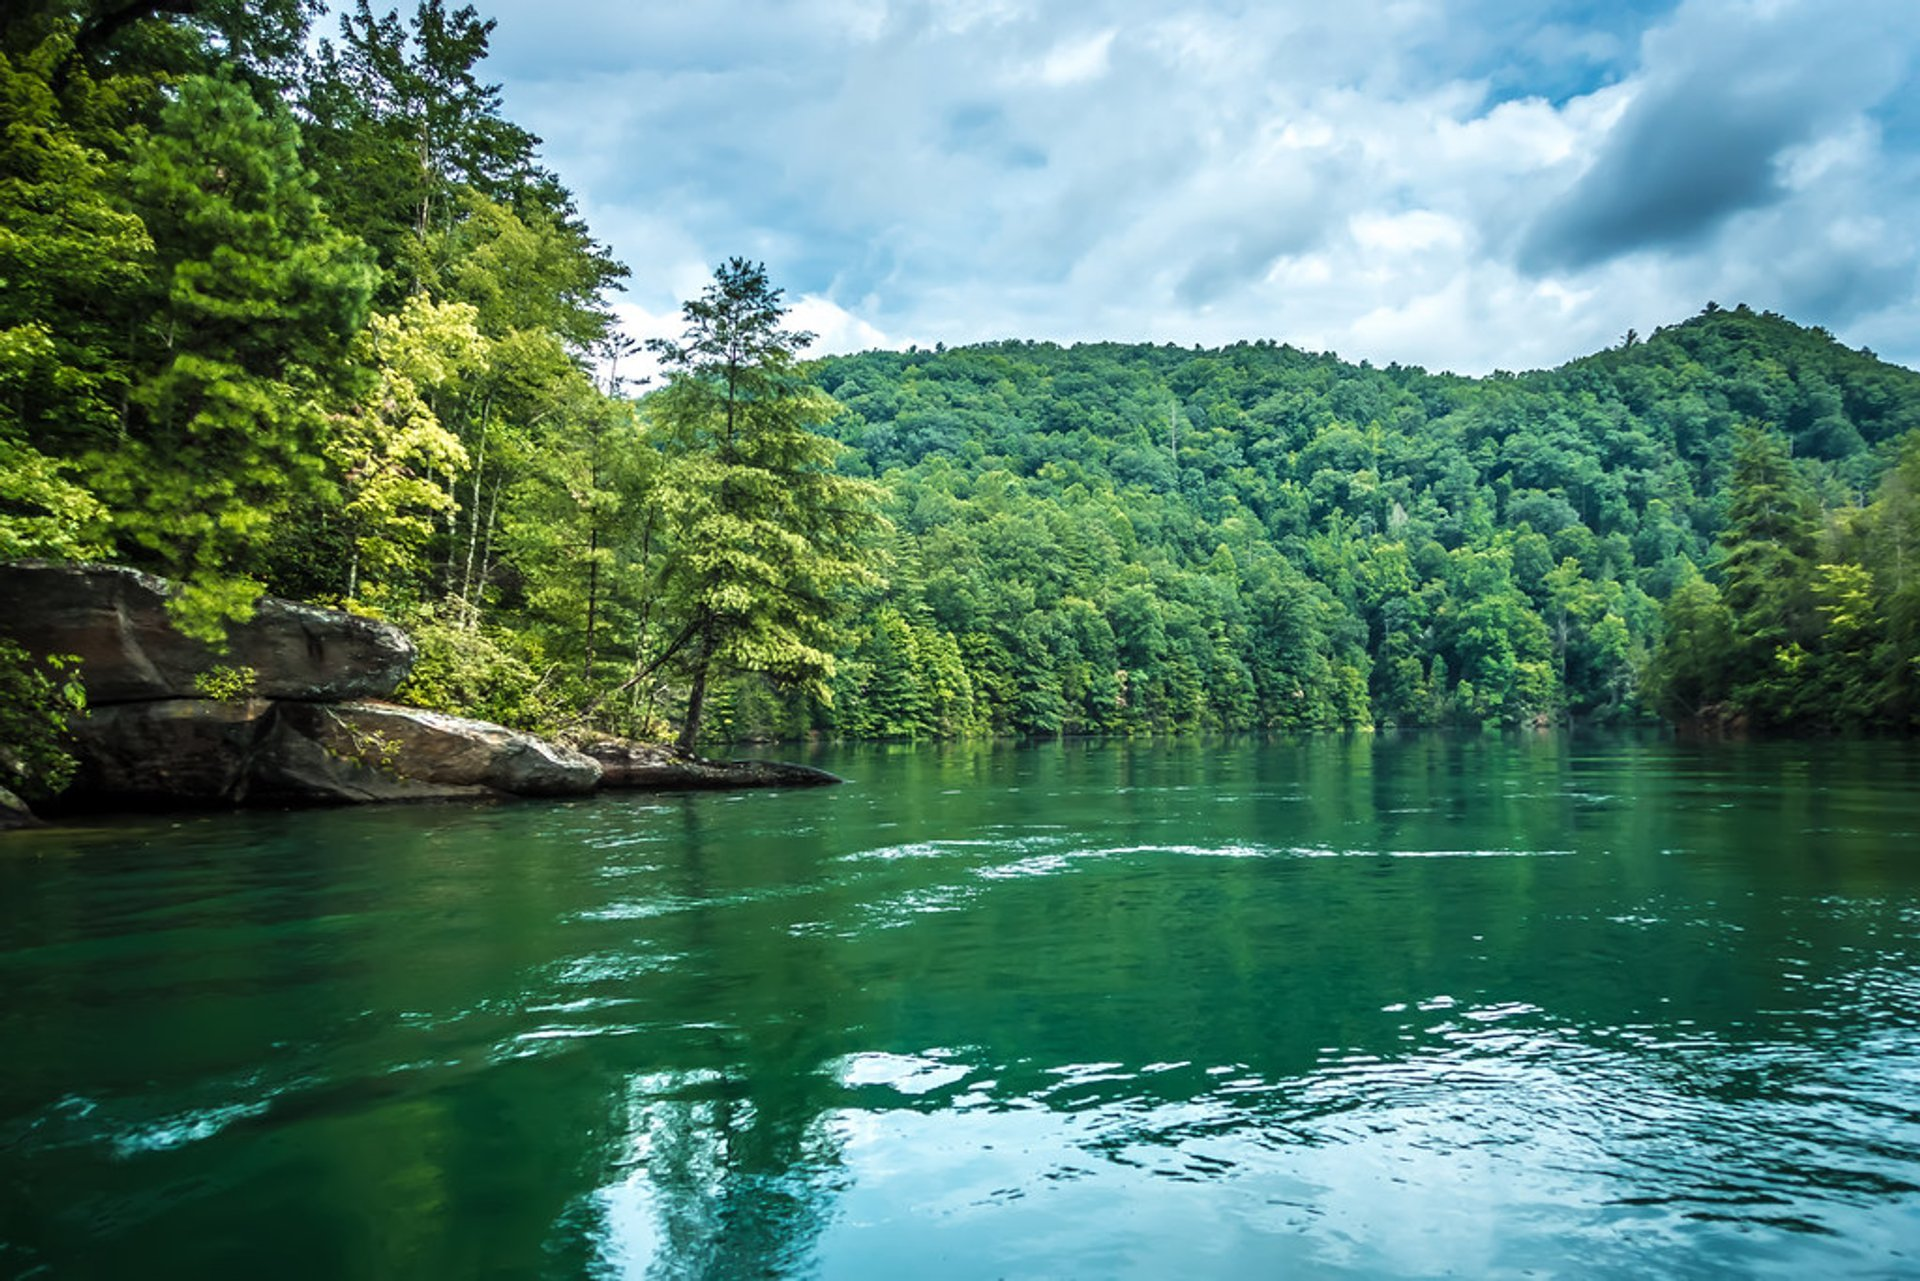 Lake Jocassee in South Carolina 2020 - Best Time